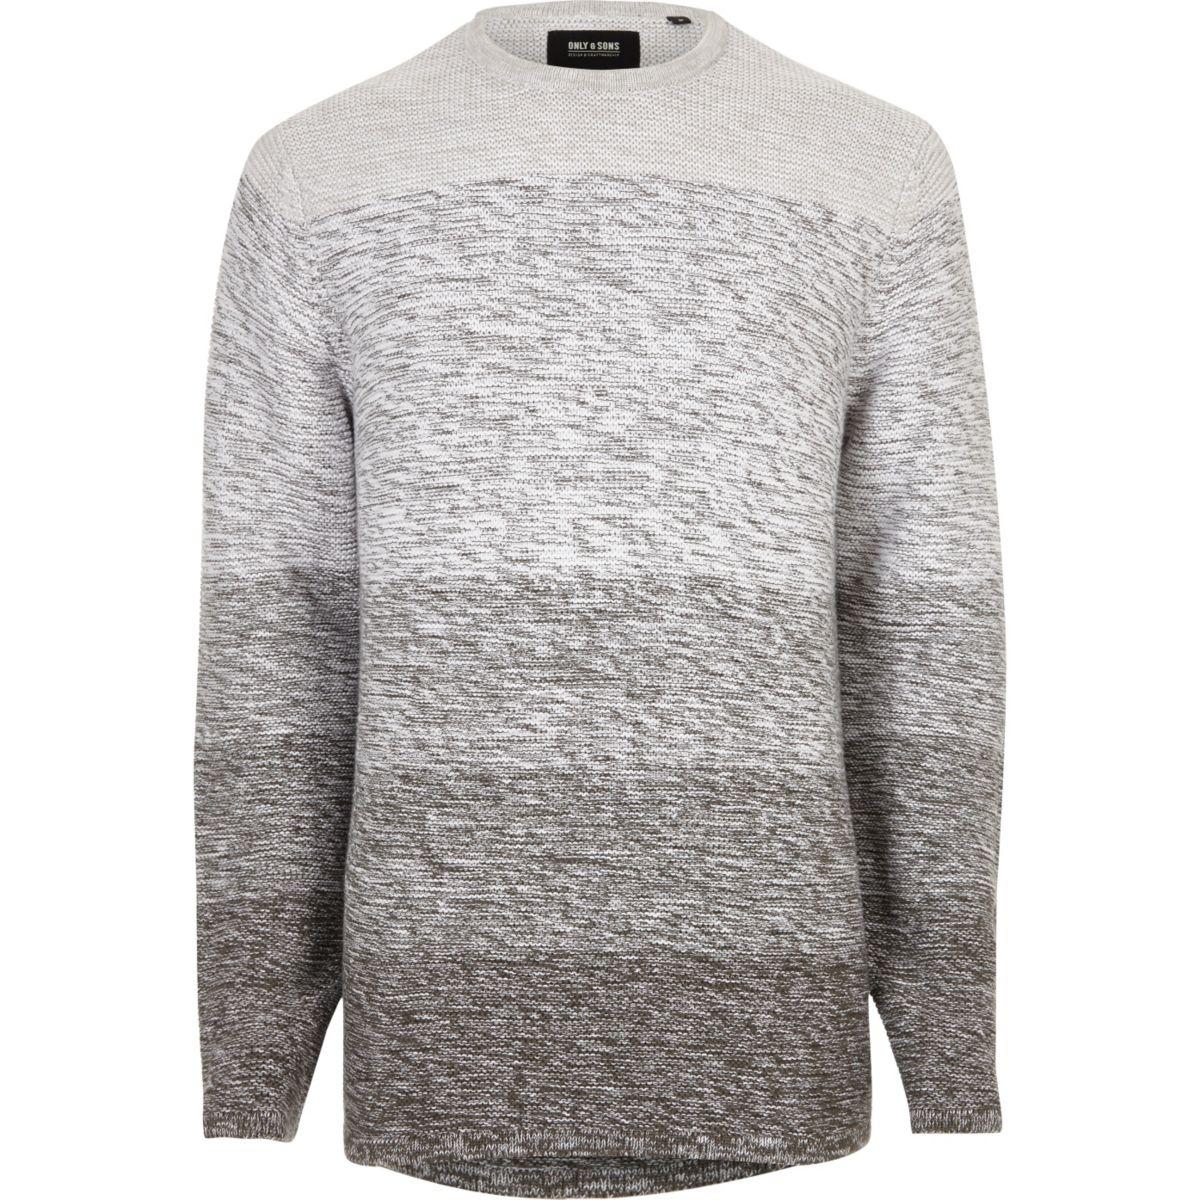 Grey Only & Sons stripe knit jumper